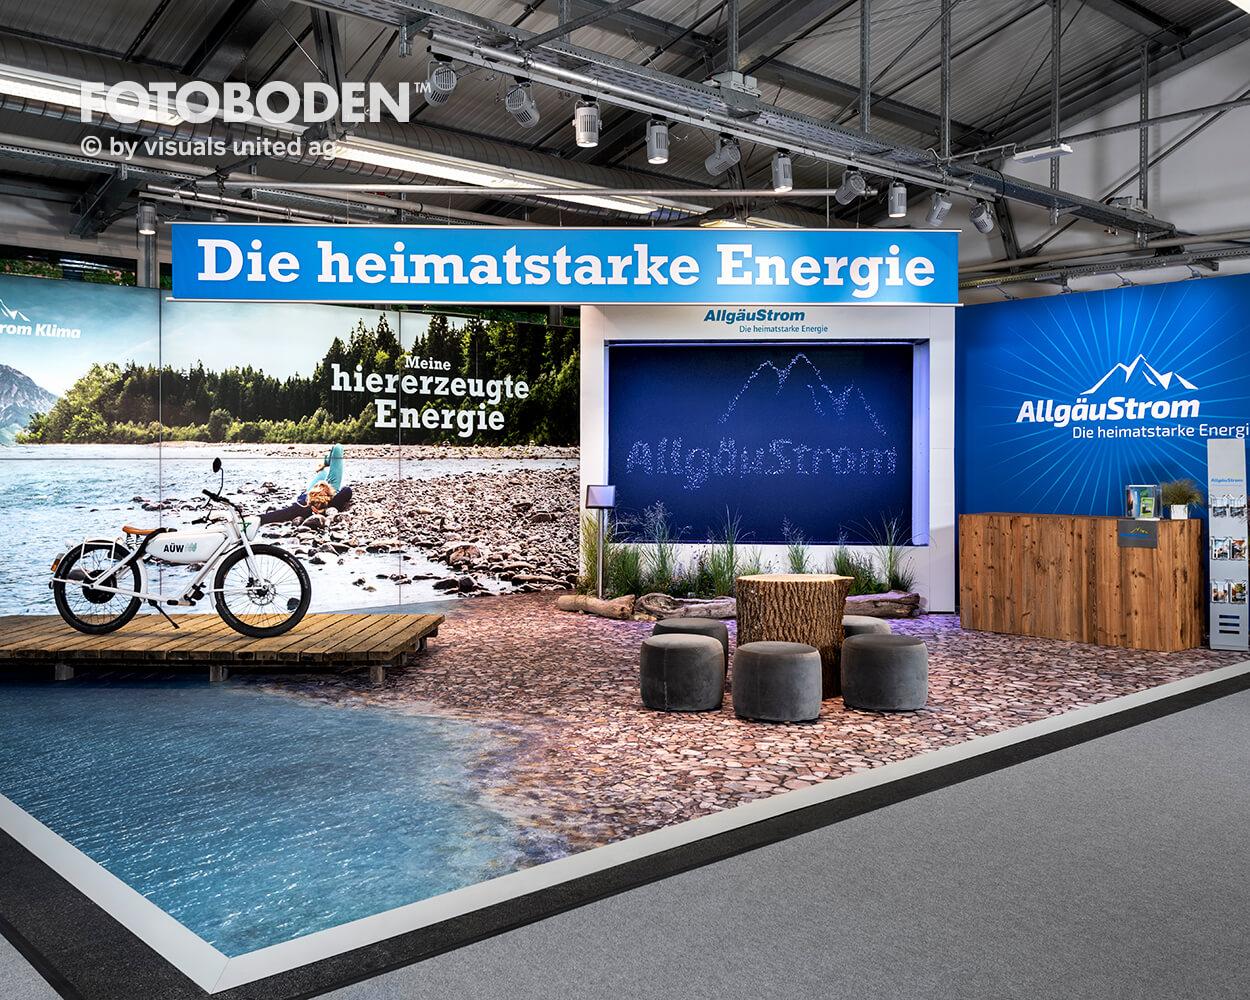 FOTOBODEN™ Messeboden Tradeshow Messedesign